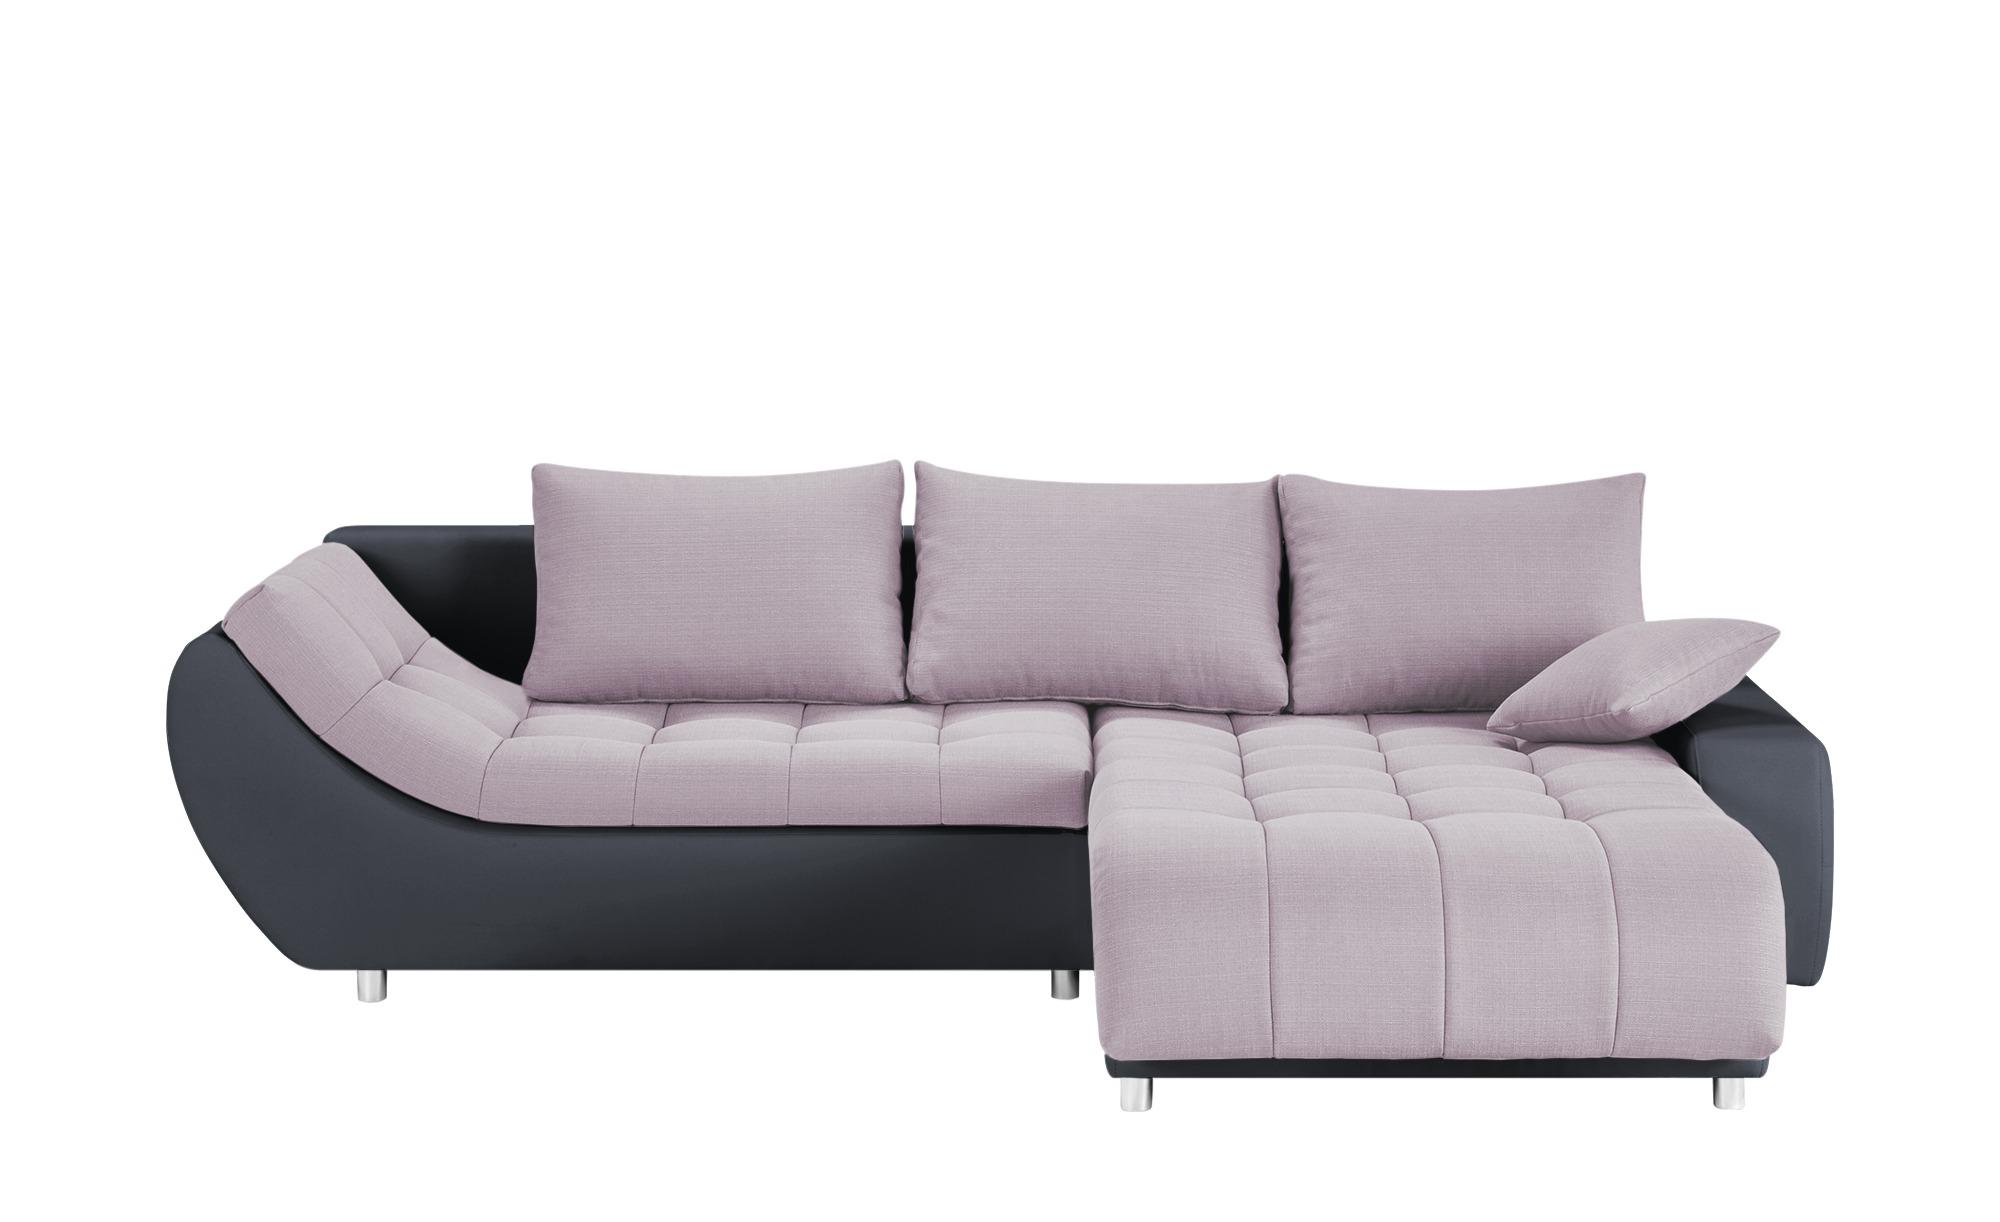 switch Ecksofa rosa/anthrazit - Kunstleder/Flachgewebe Cumulus ¦ rosa/pink ¦ Maße (cm): H: 73 Polstermöbel > Sofas > Ecksofas - Höffner